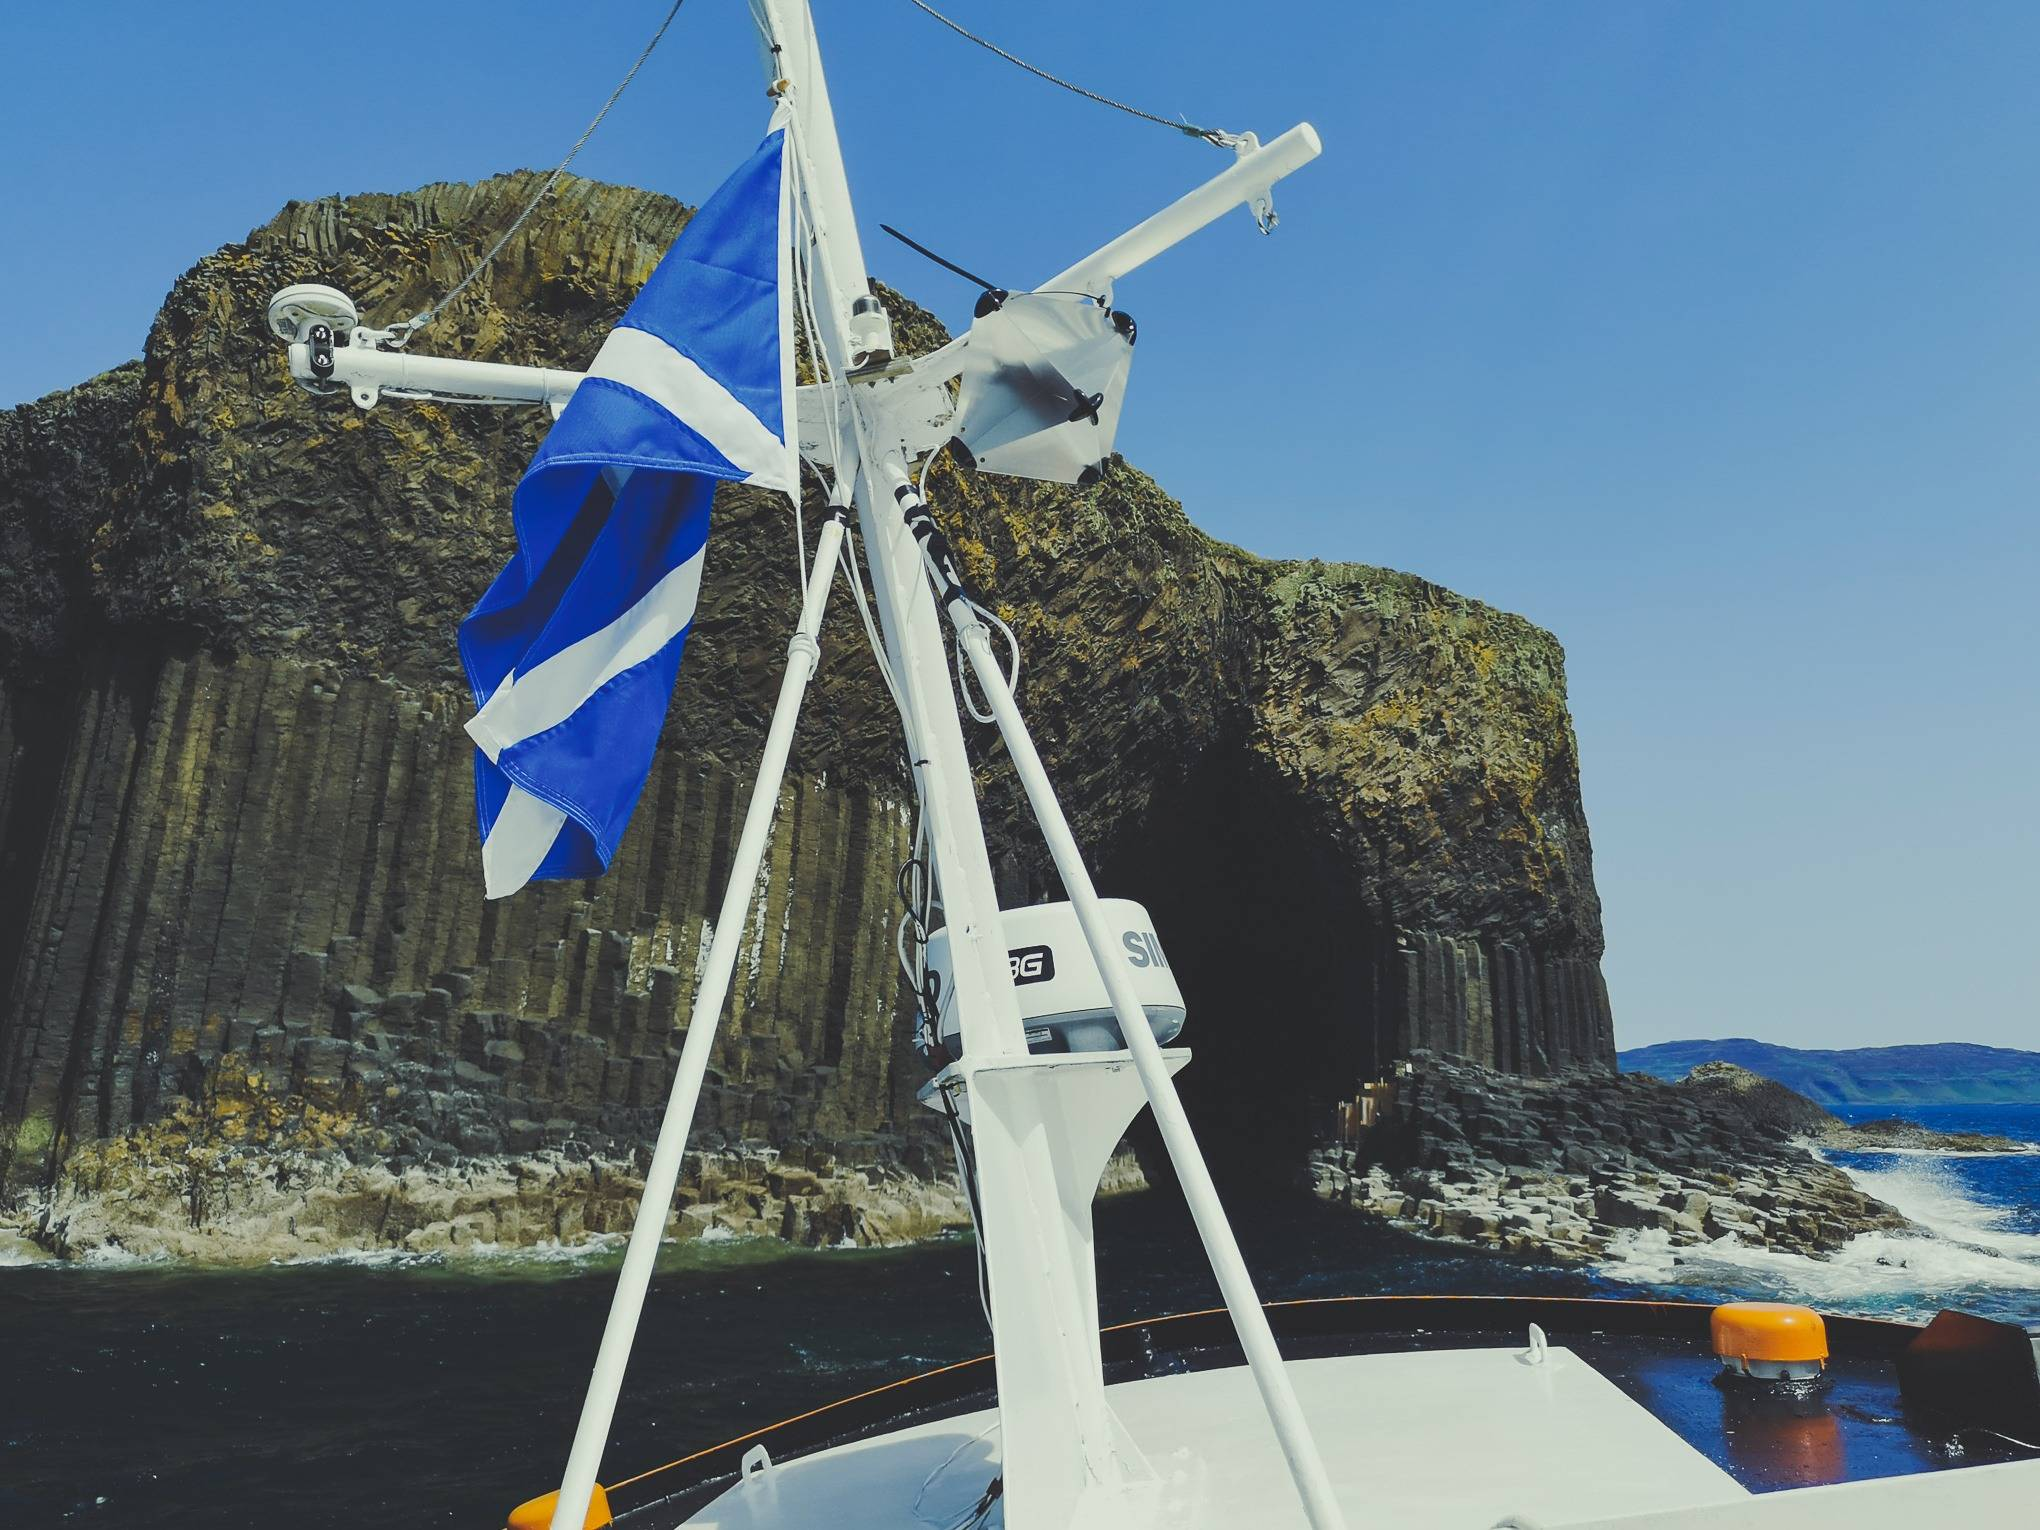 Boat approaching Fingal's Cave, Staffa Island, Hebrides, Scotland